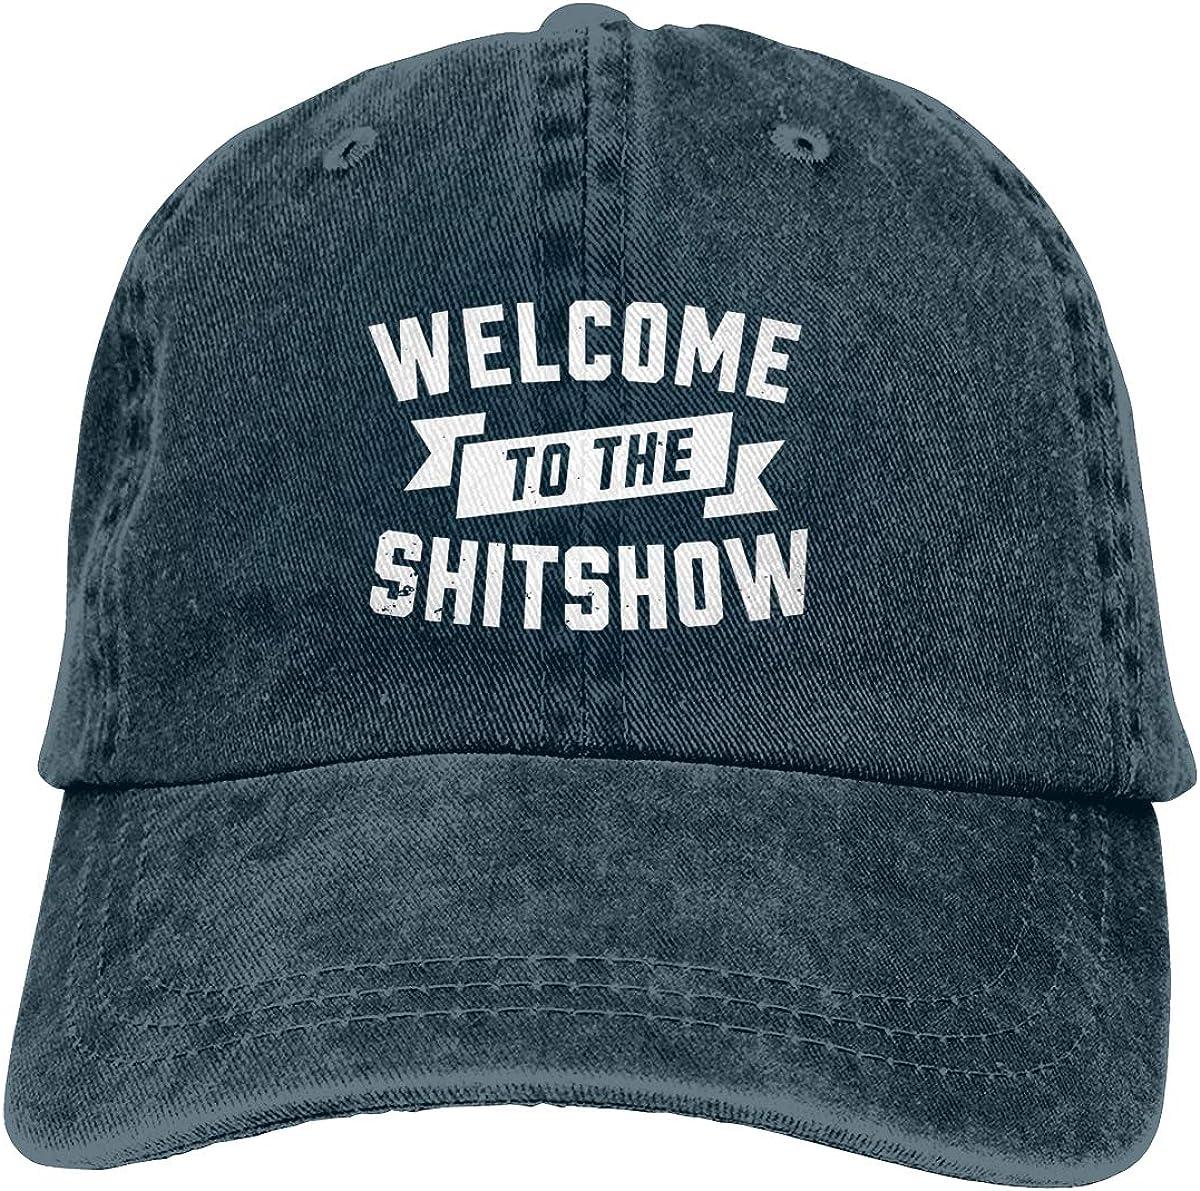 Welcome to The Shitshow Cowboy Hat Unisex Adjustables Denim Sport Hat